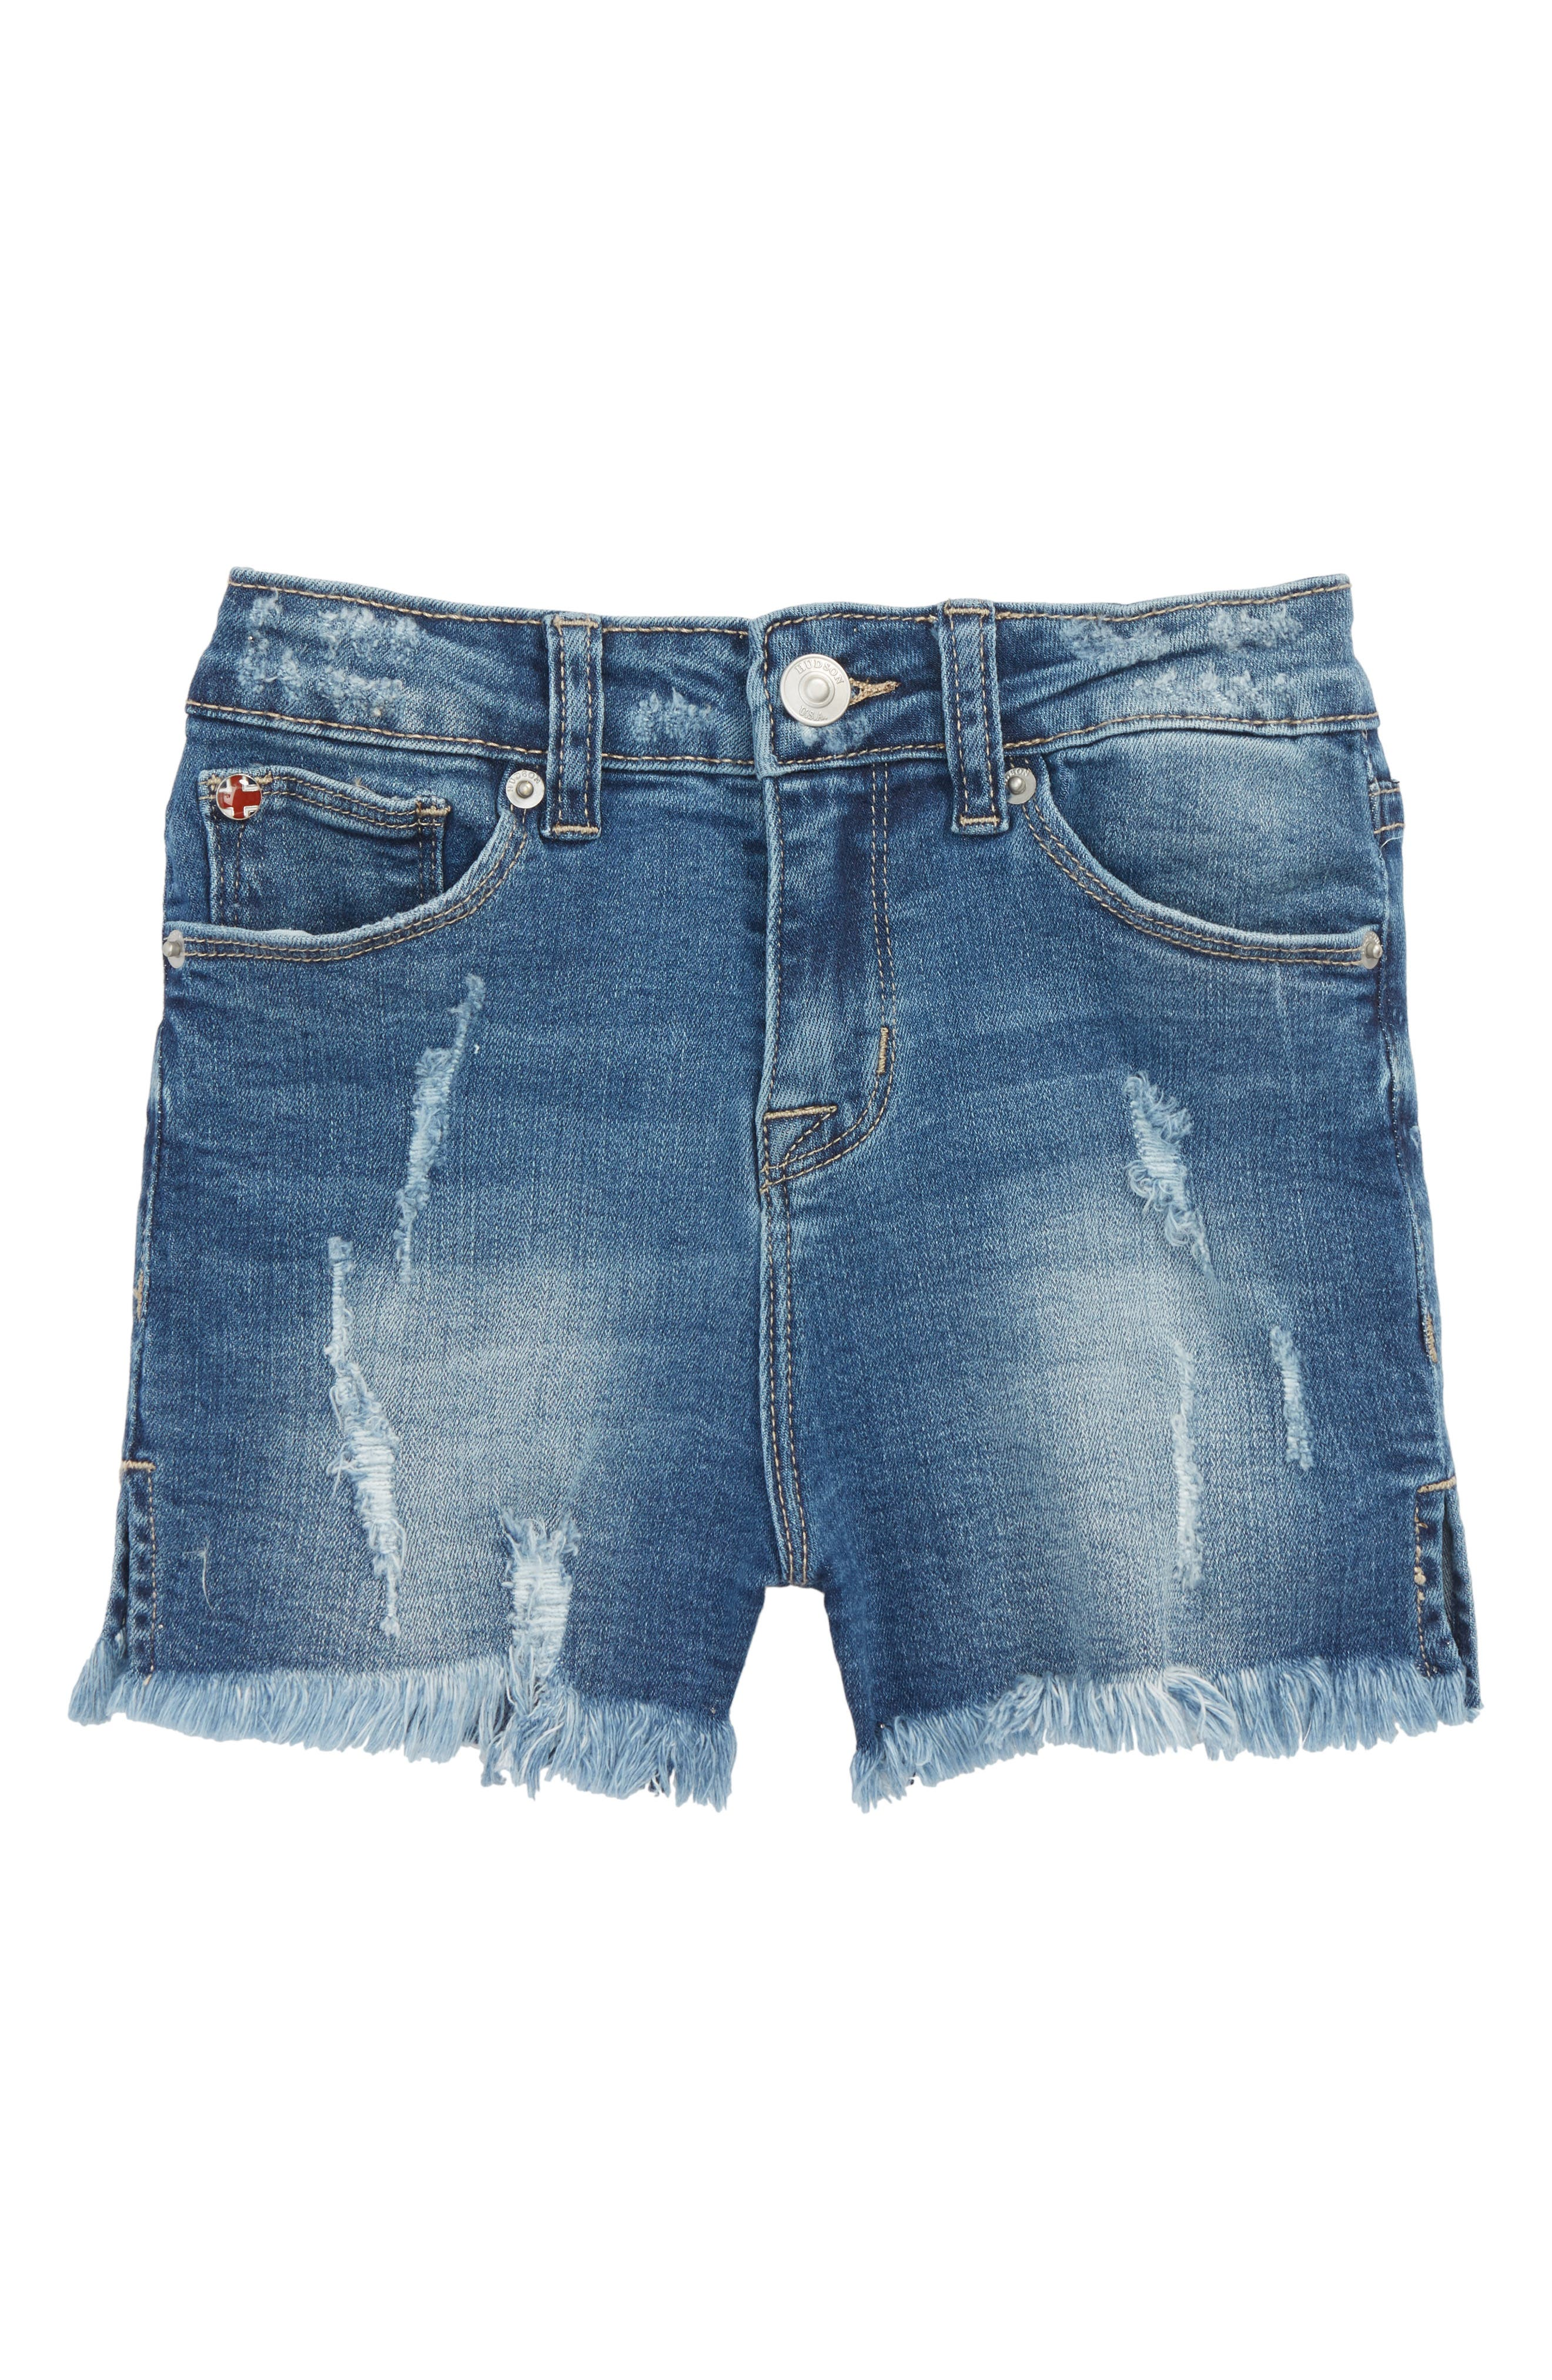 Lily High Waist Cutoff Denim Shorts,                         Main,                         color, 499